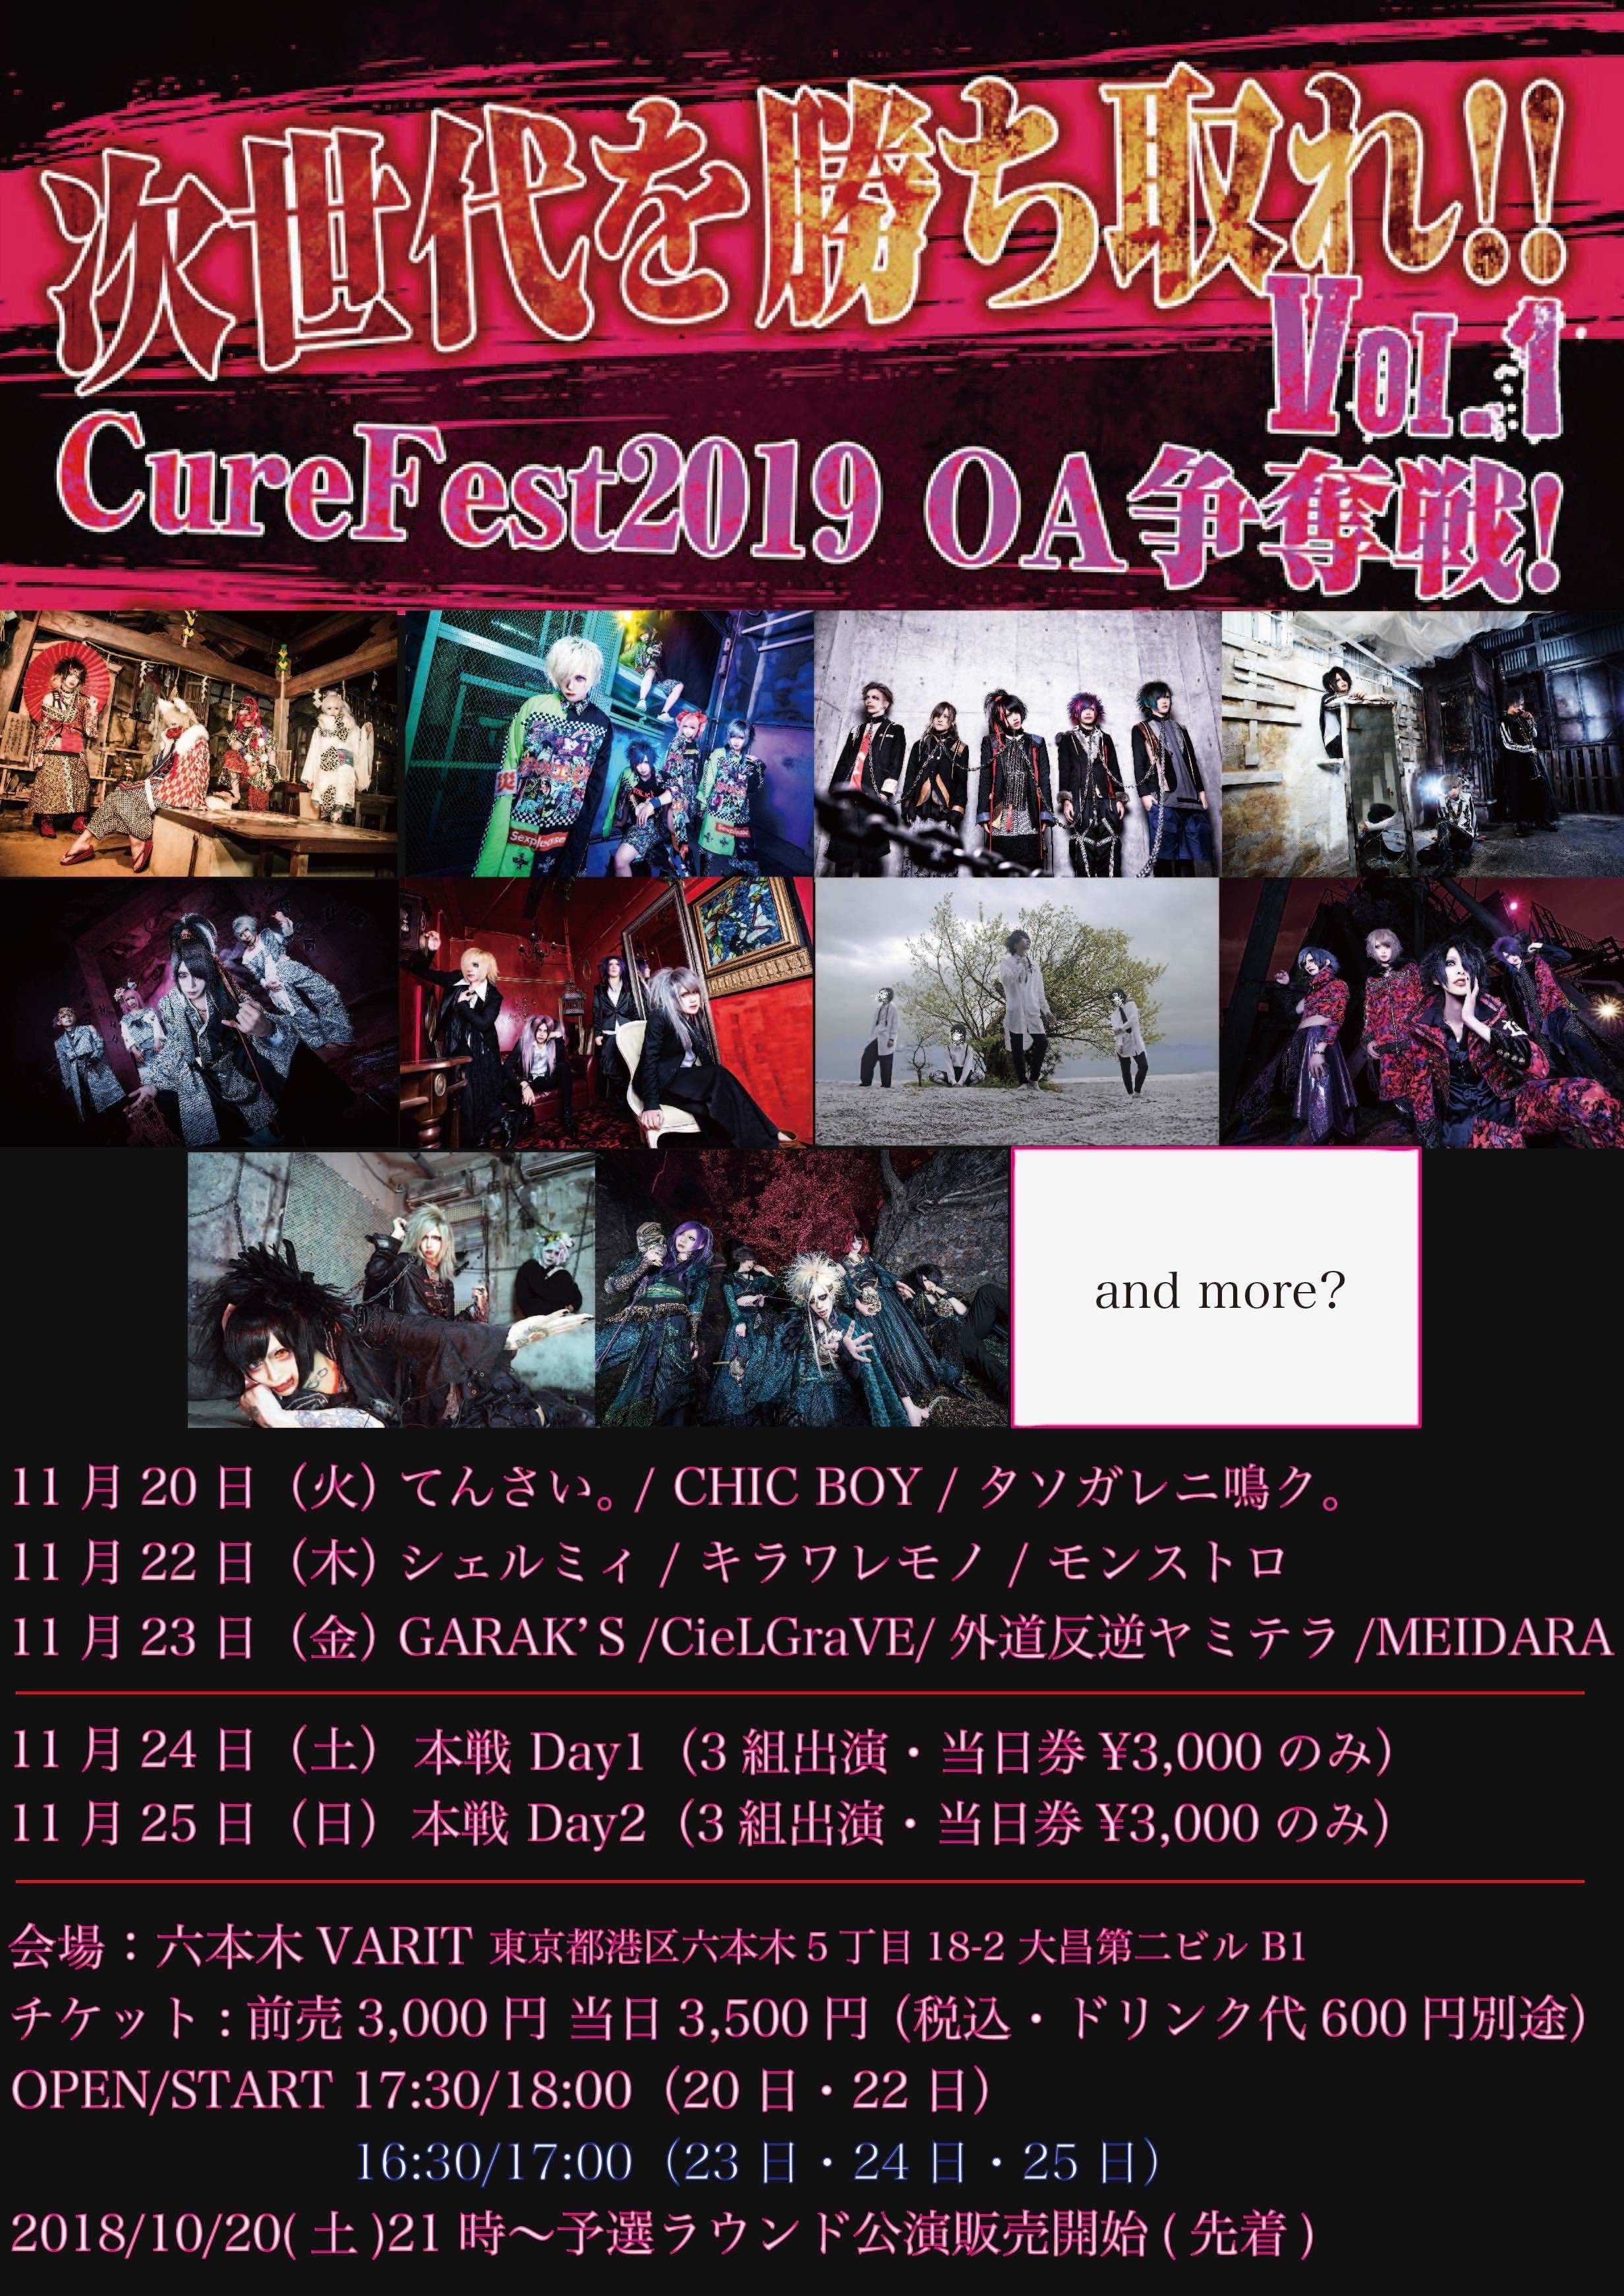 『CureFest2019 OA争奪戦!vol.1』(11/22公演)